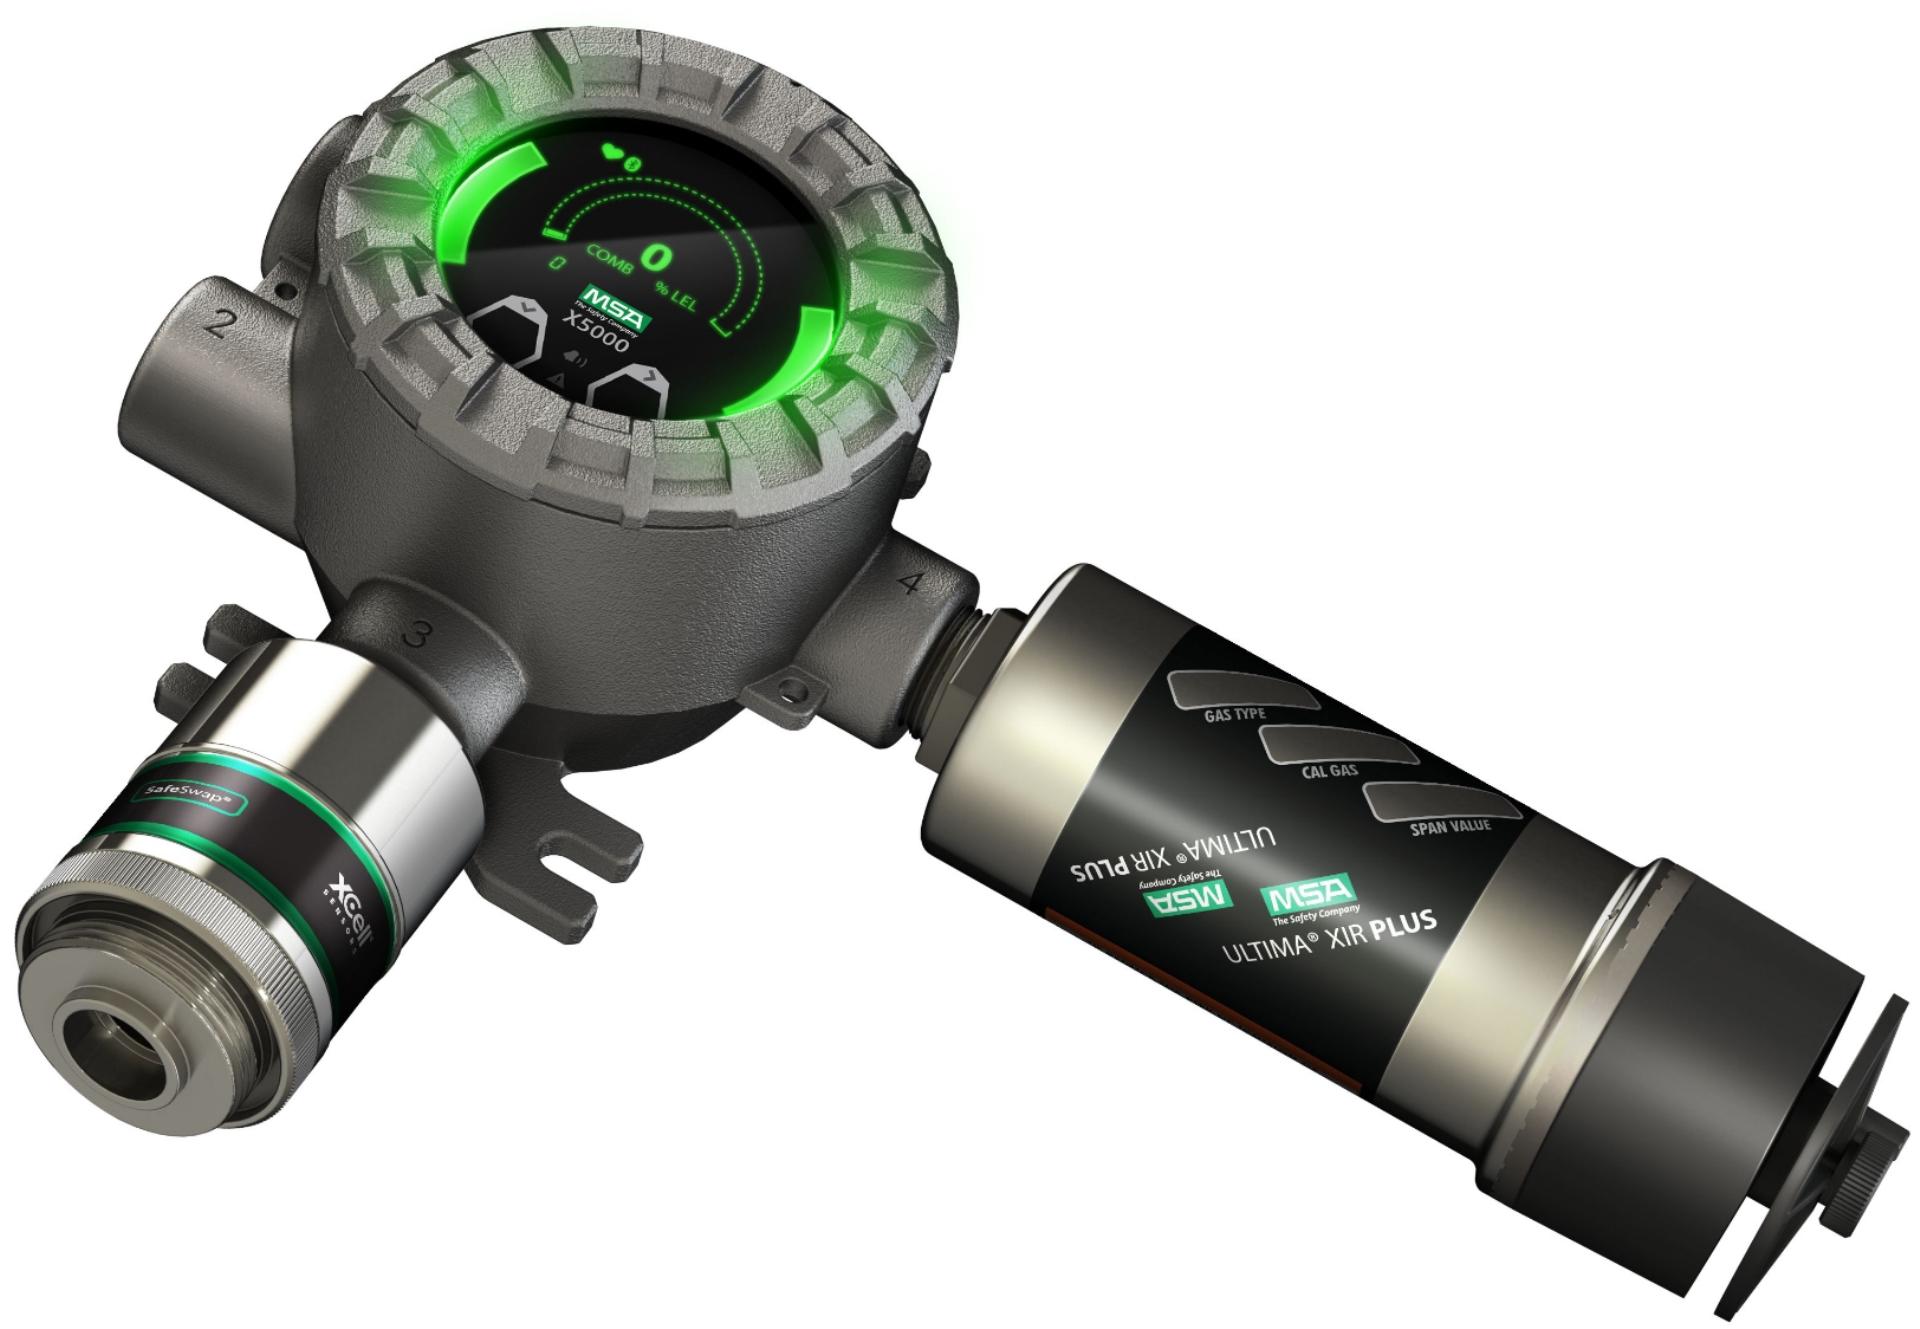 MSA Safety gassdetektor Gas detector Transmitter Gas leak detector MSA Ultima X5000 DUAL sensor Gasslekkasje gassmler gassalarm portable portabel